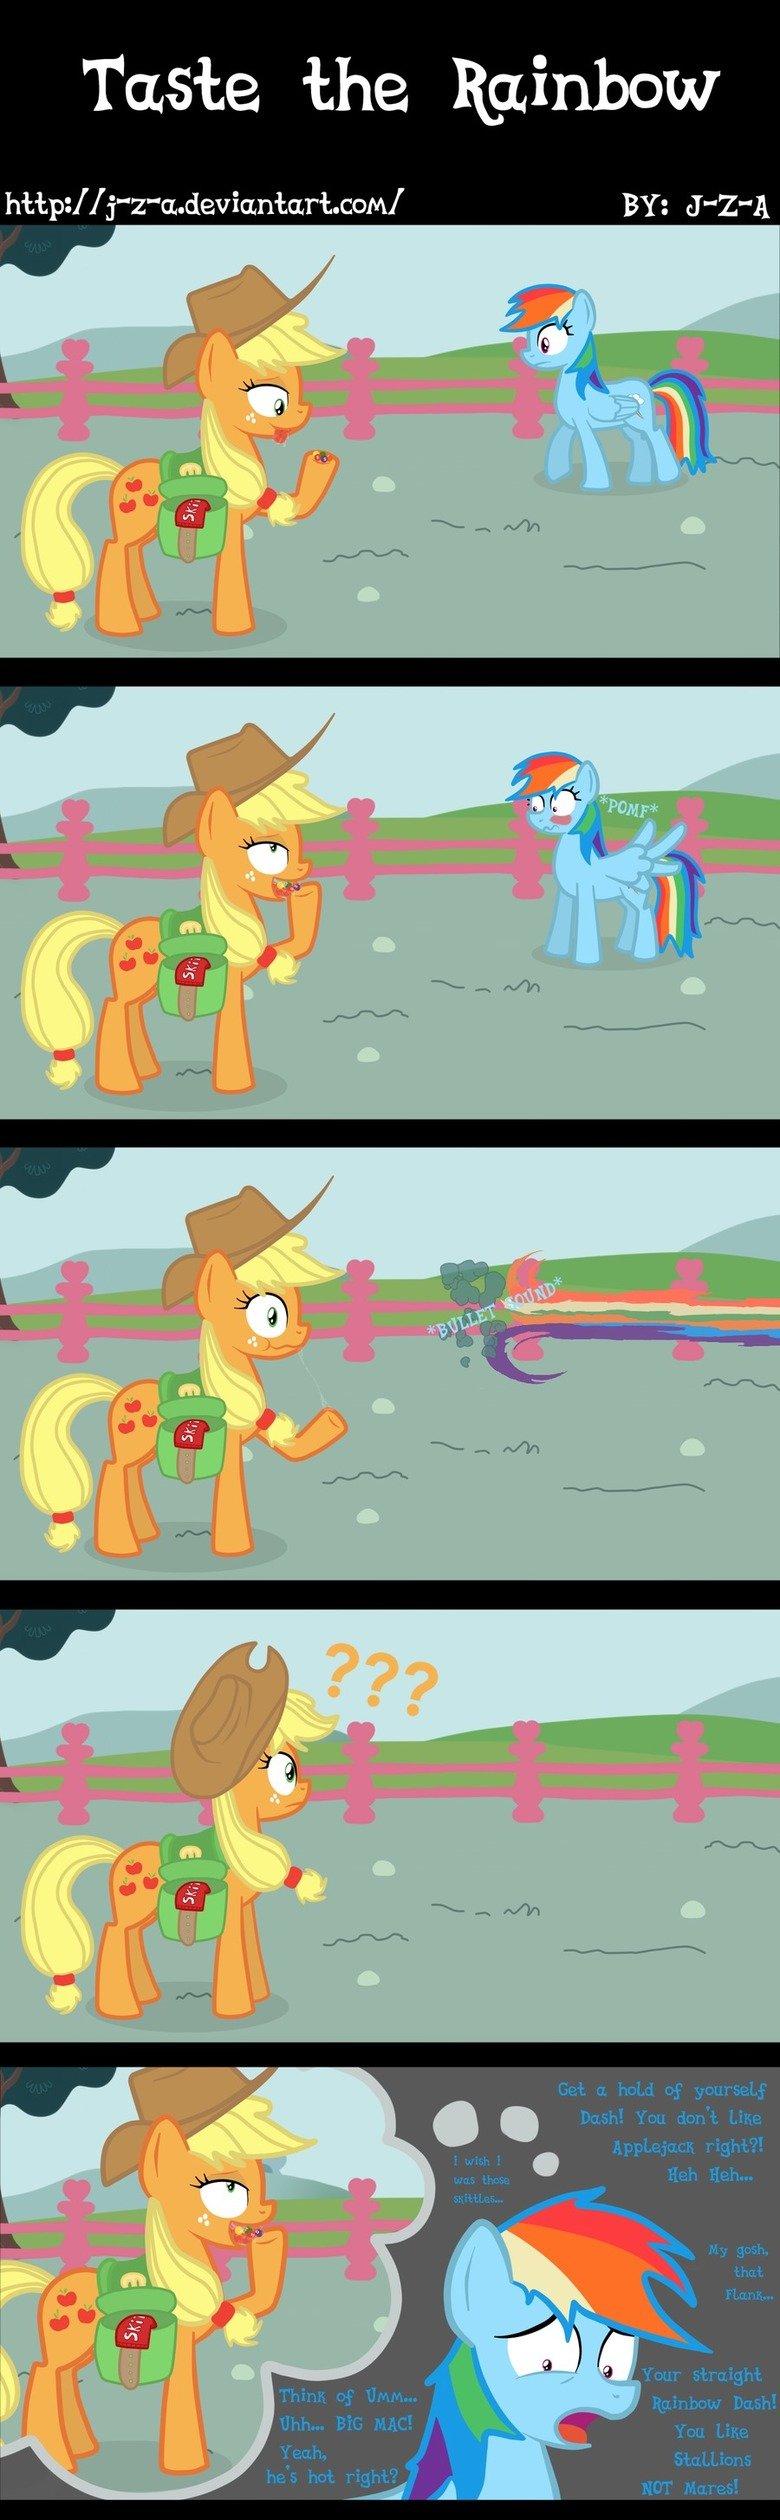 Taste the Rainbow. . Taste the Rainbow lellel BY: 'leel ponies comic